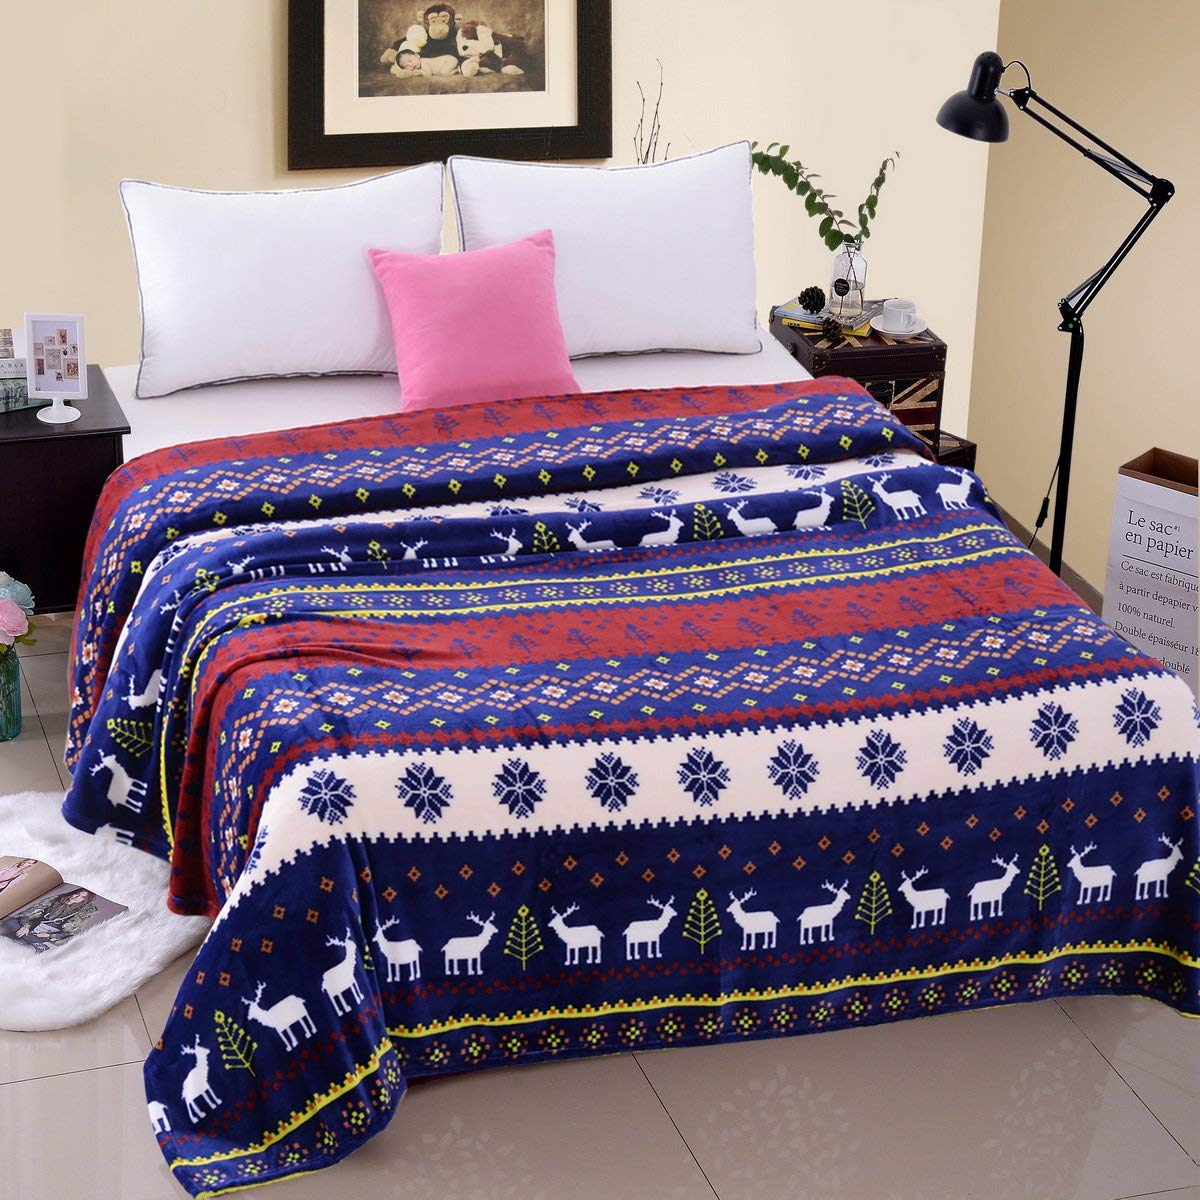 Flannel Fleece Blanket Plush Super Soft Warm Fuzzy